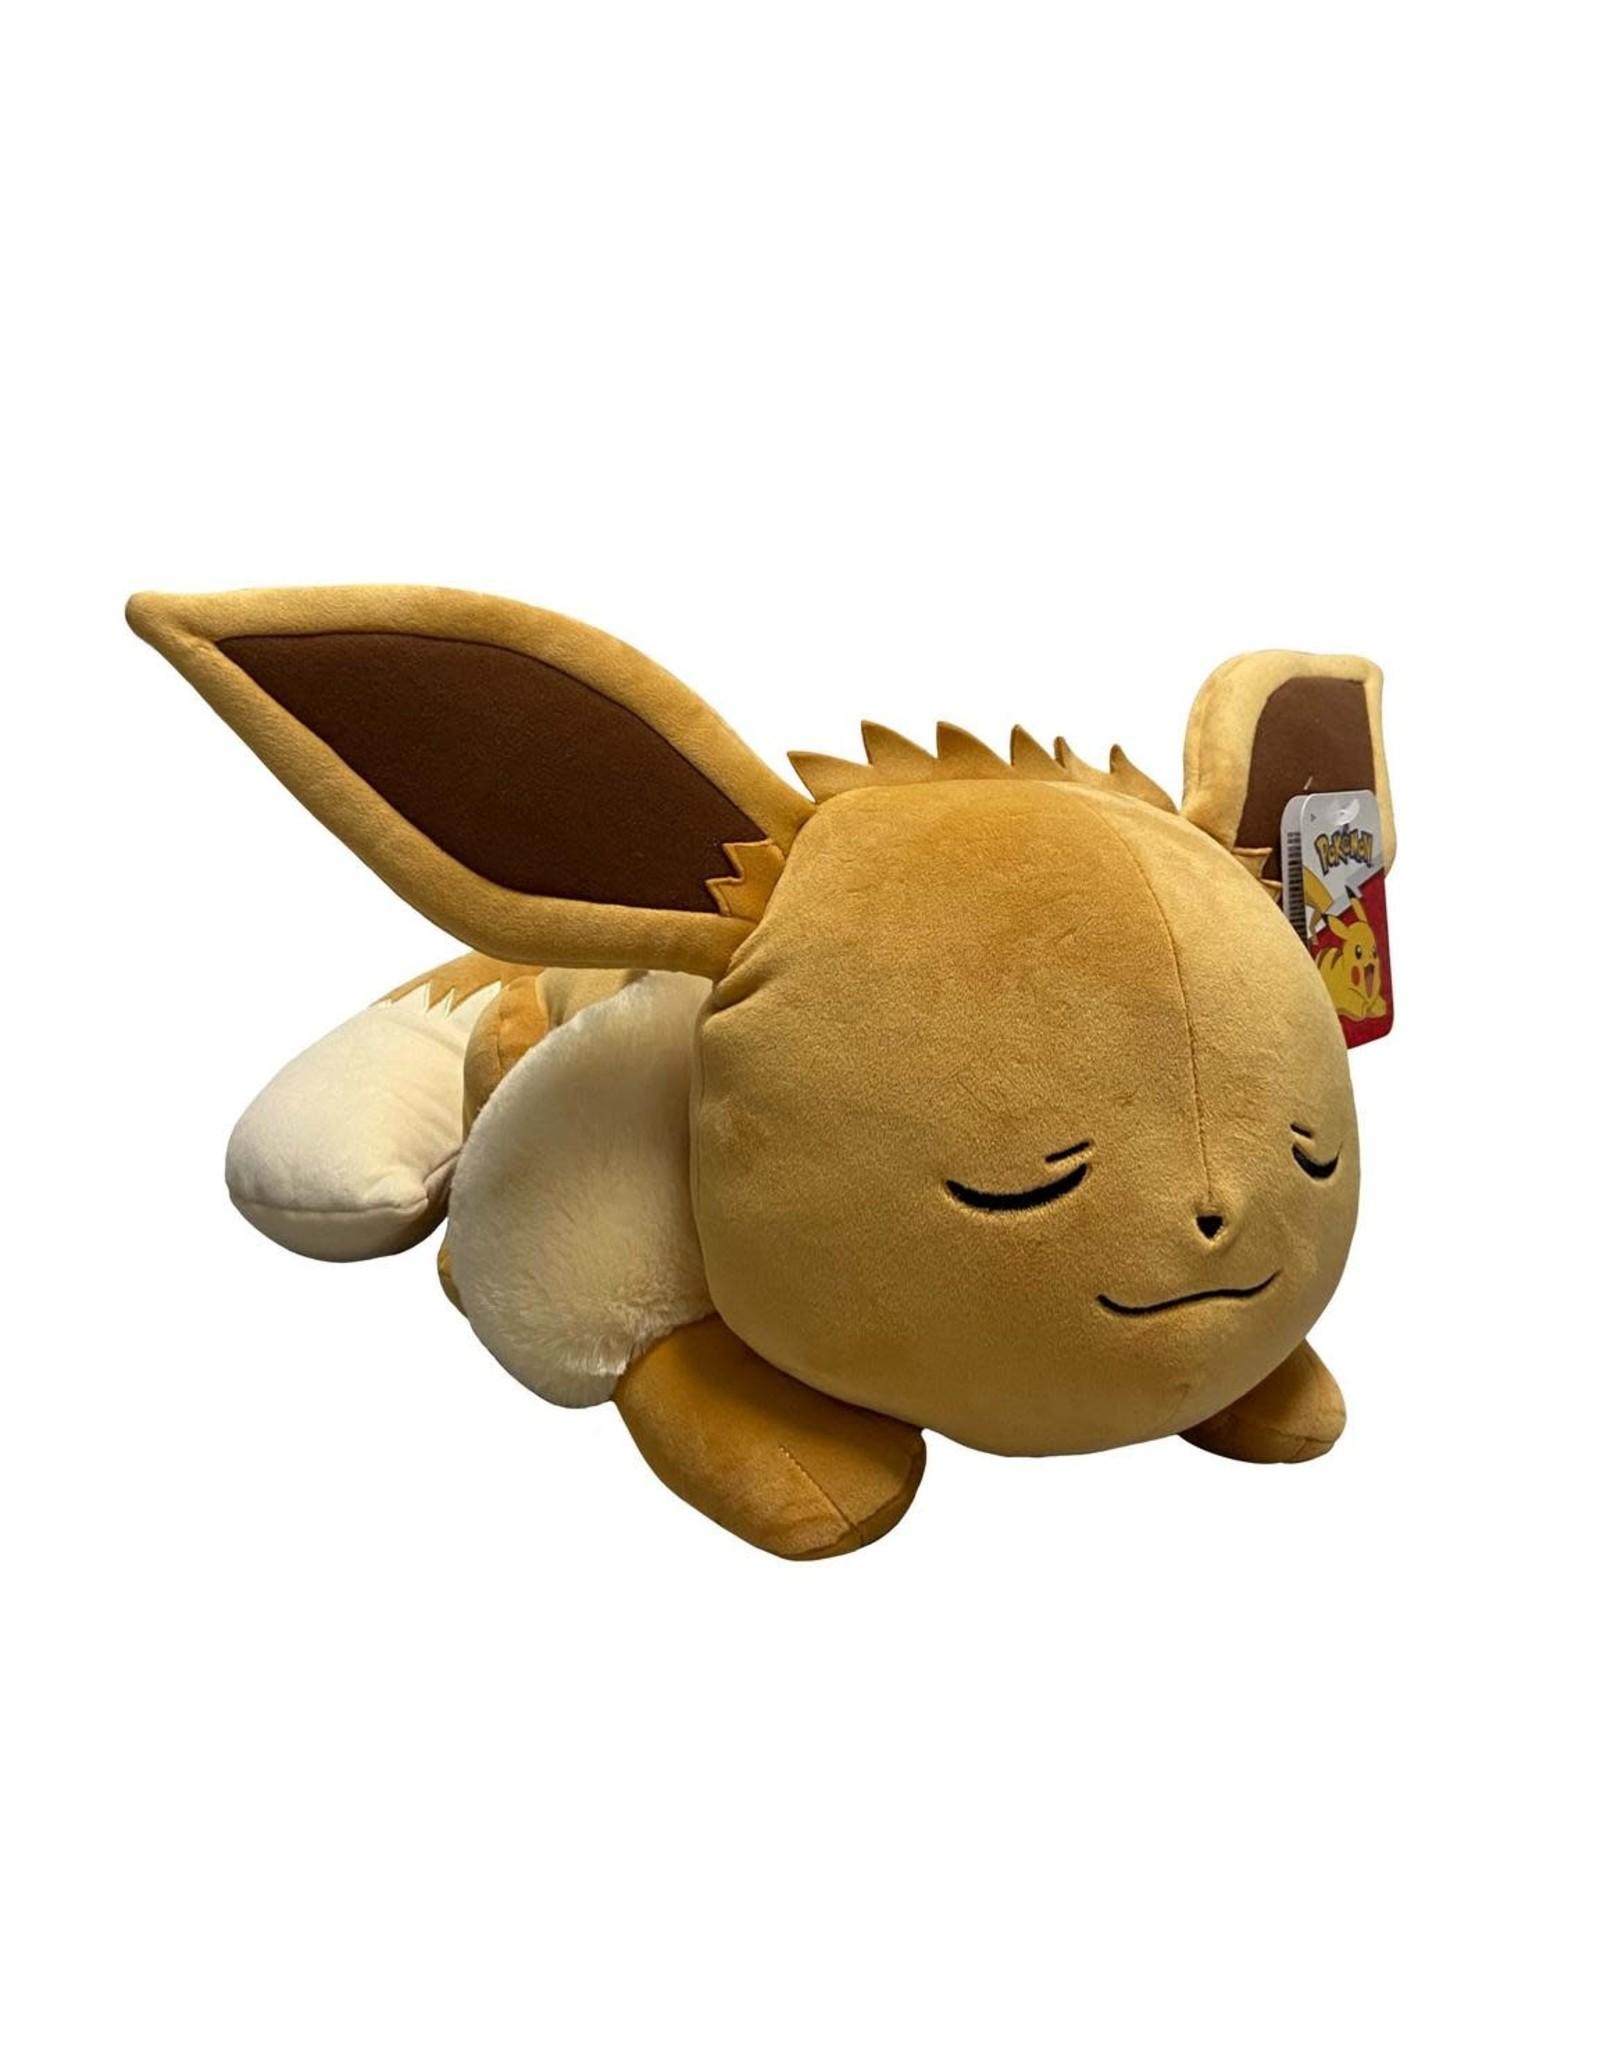 Pokémon Big Plush - Sleeping Eevee - 45 cm